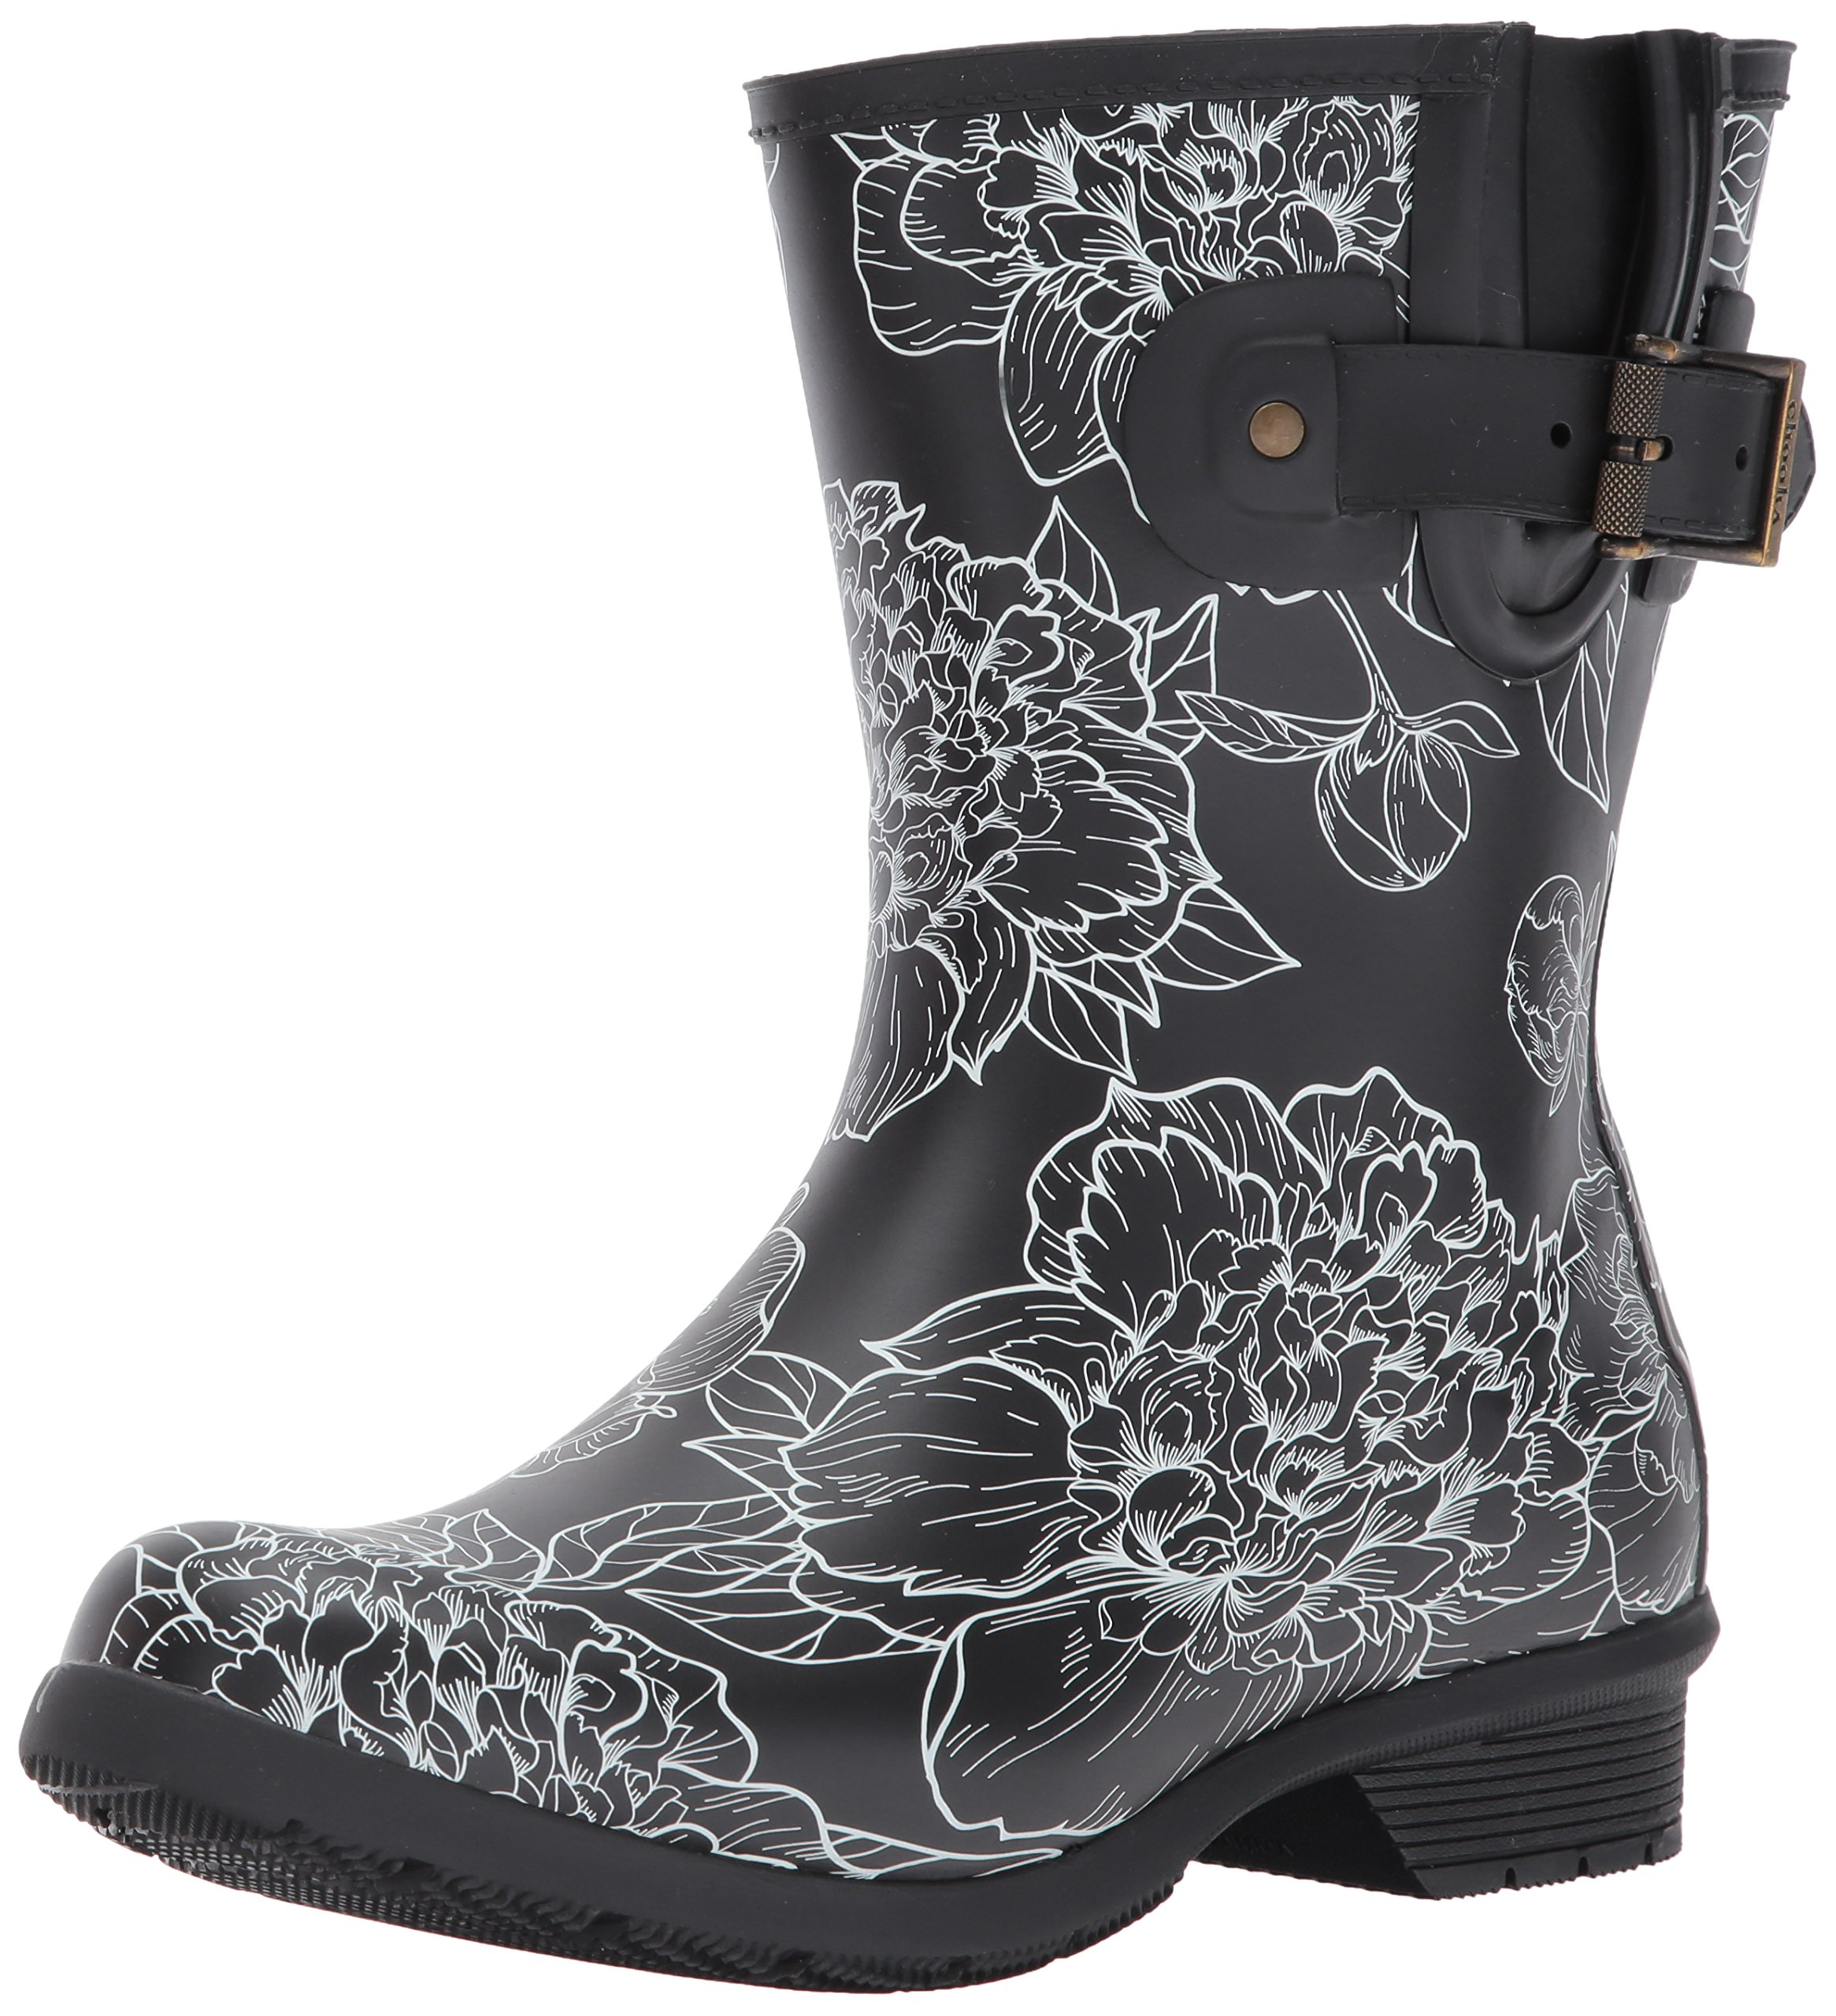 Chooka Women's Waterproof Mid-Height Printed Memory Foam Rain Boot, Cora, 9 M US